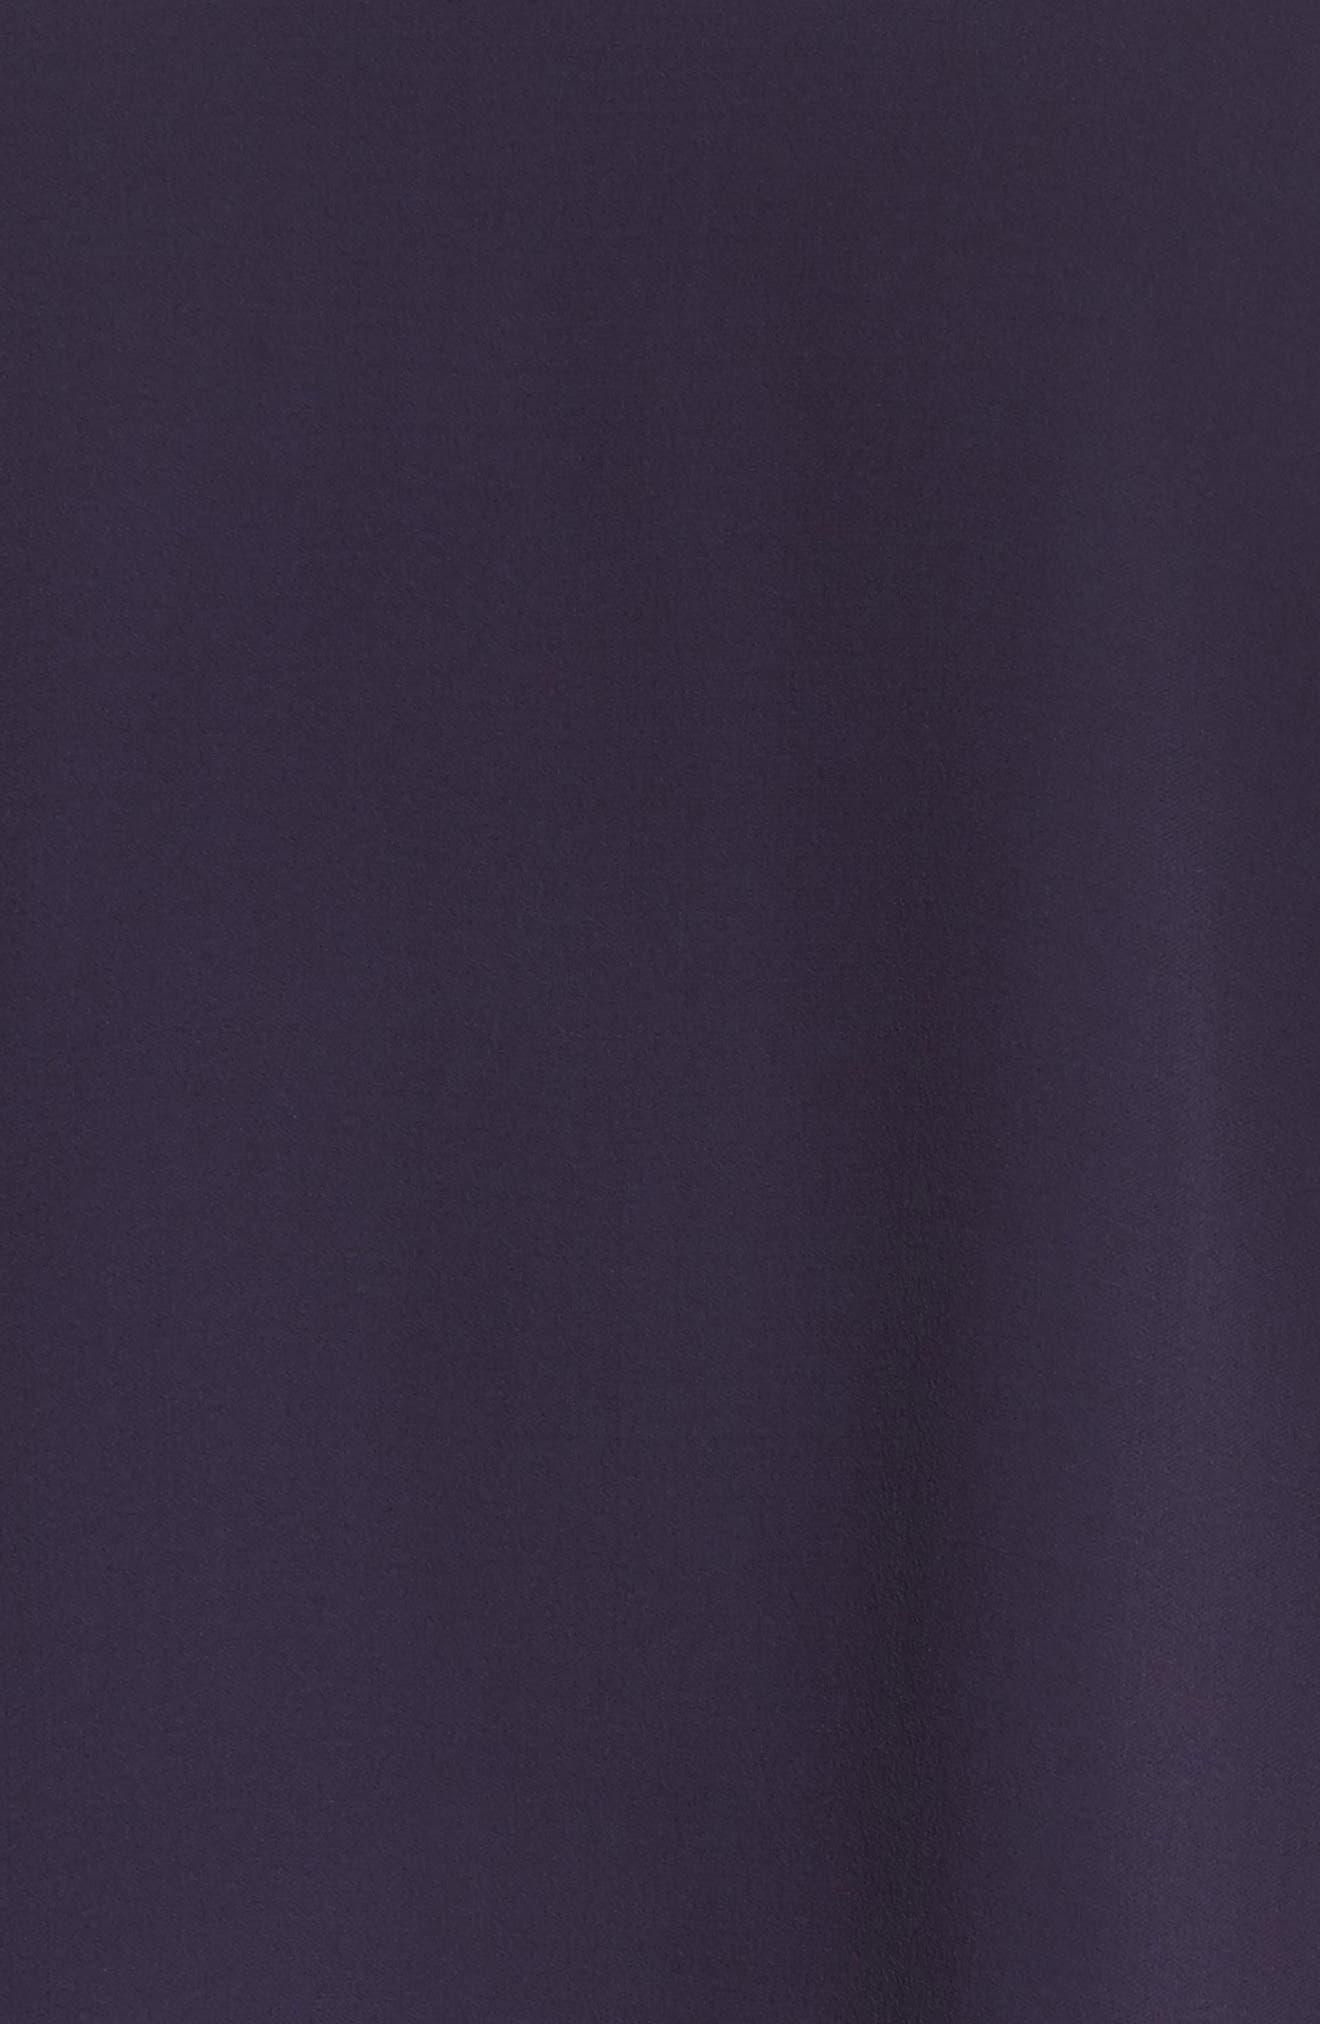 Ruffled Sleeve Silk Top,                             Alternate thumbnail 16, color,